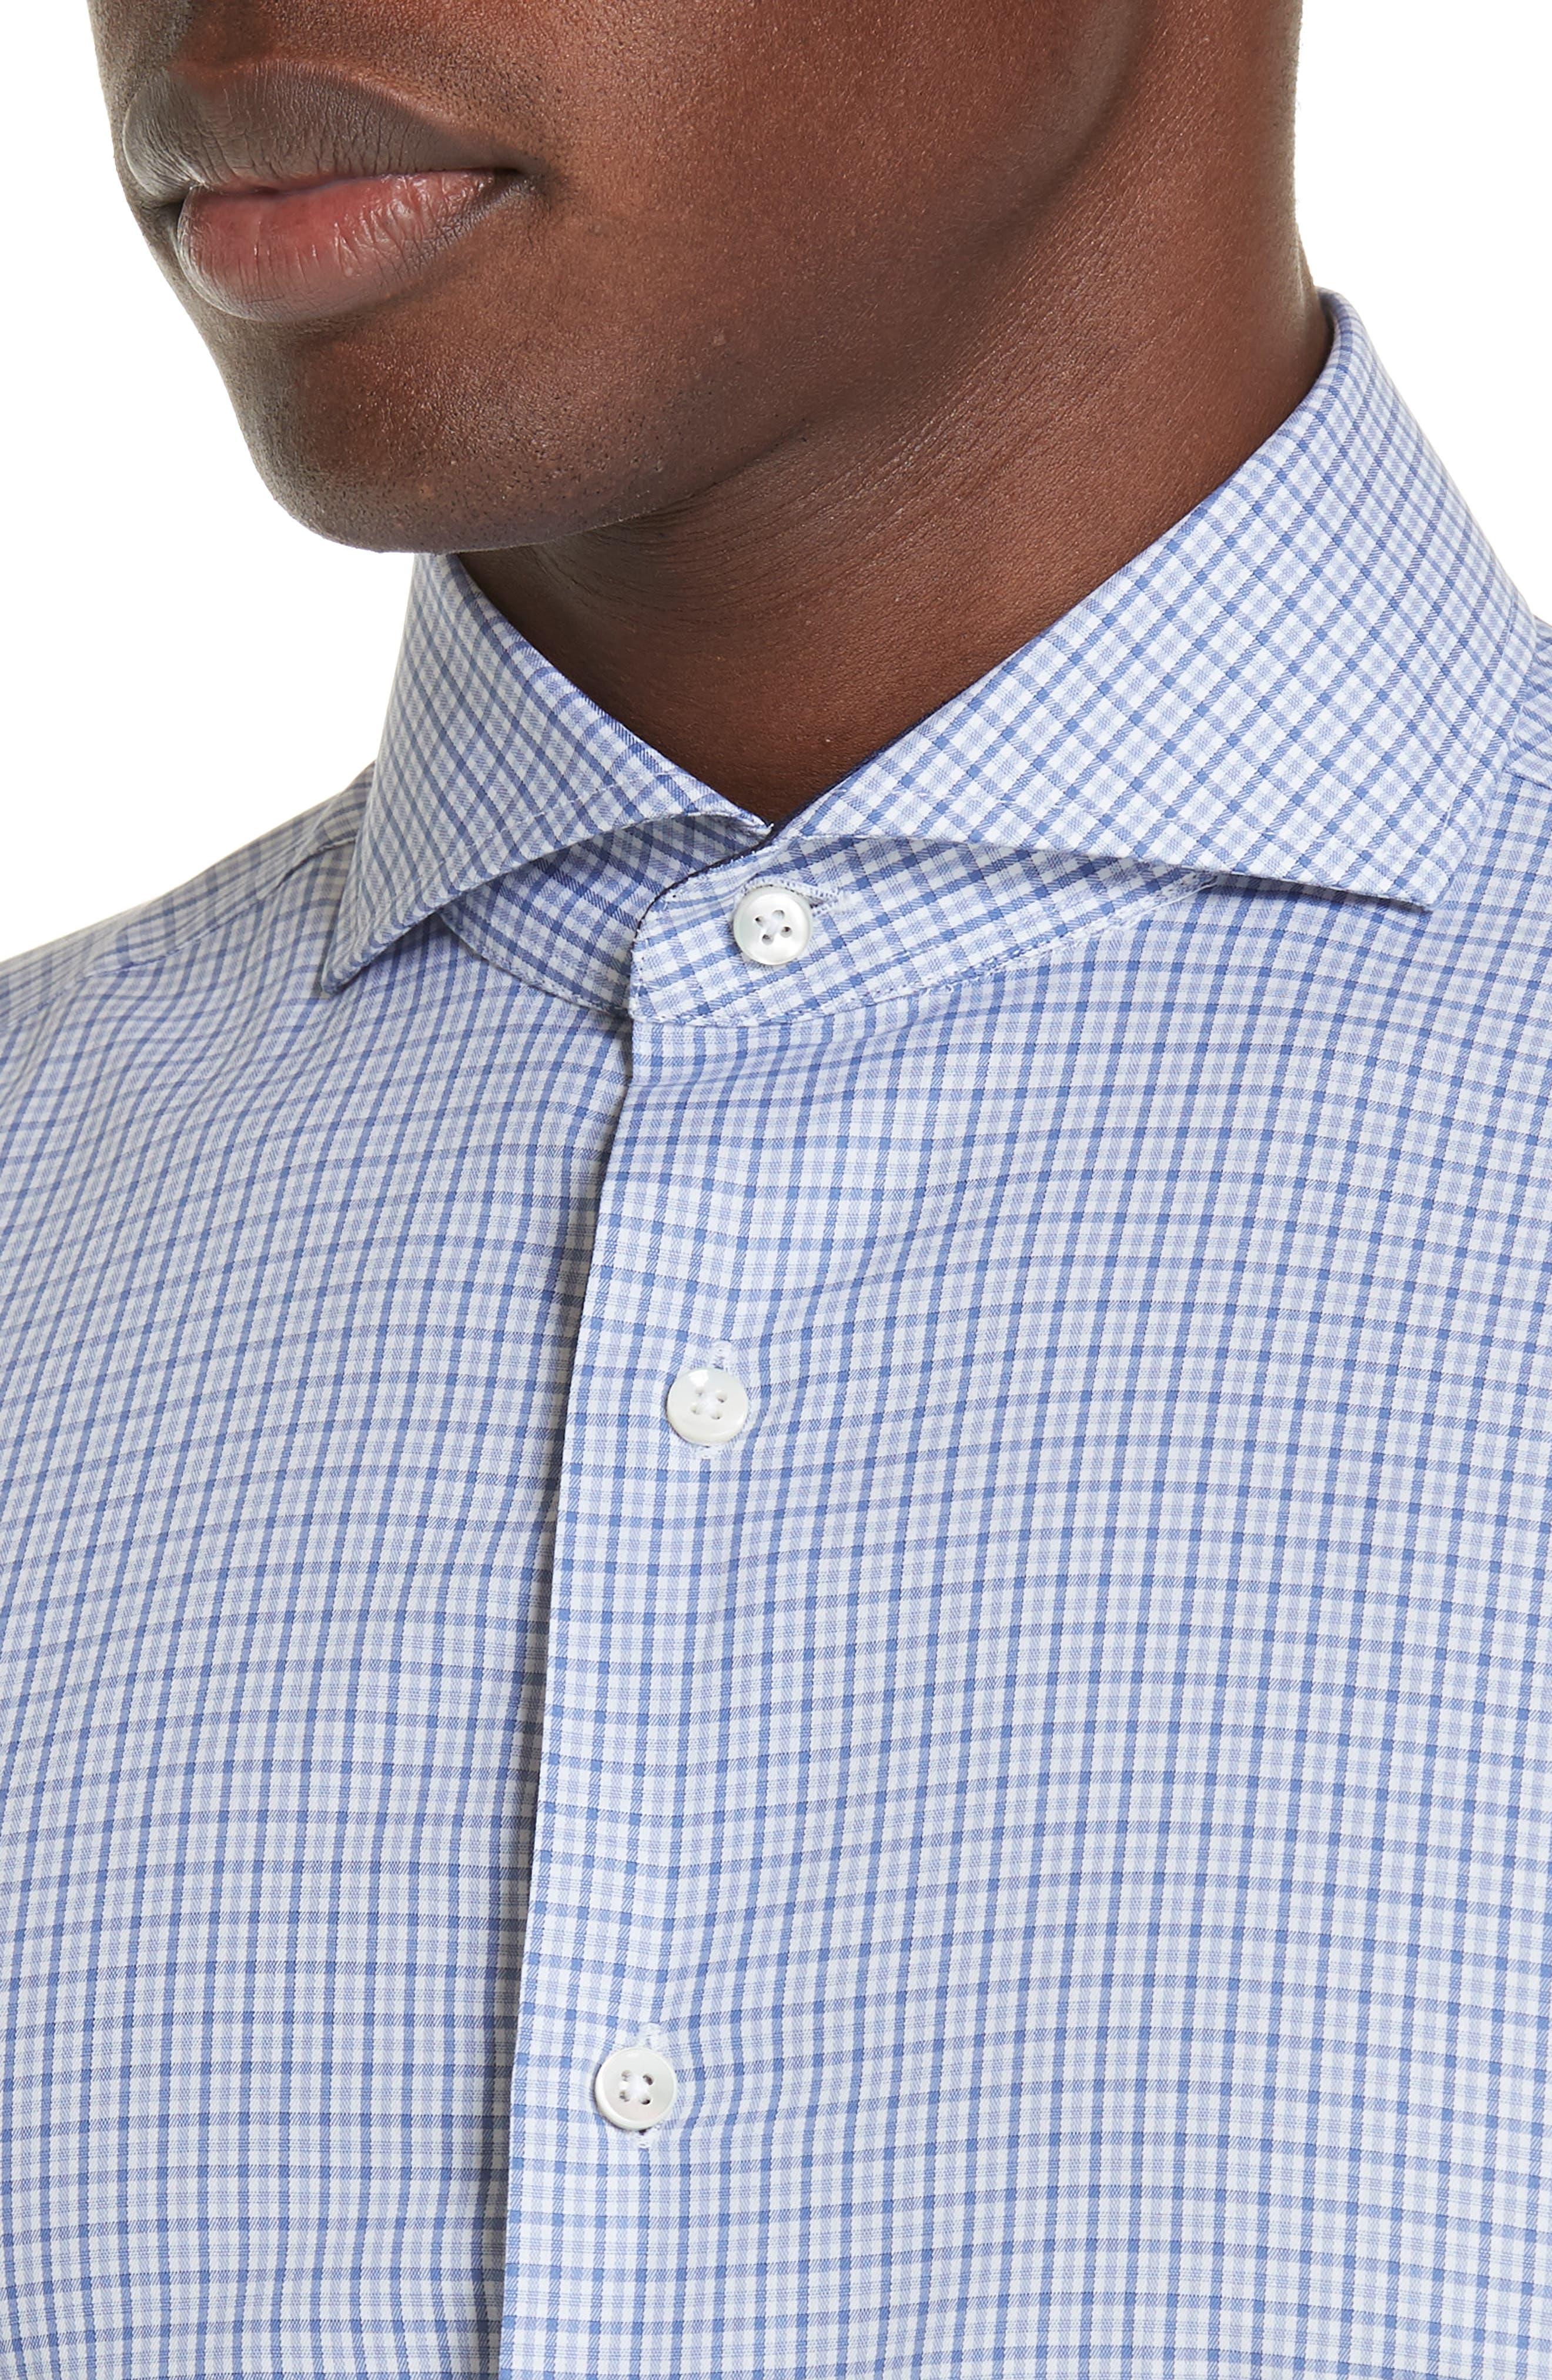 Regular Fit Check Dress Shirt,                             Alternate thumbnail 2, color,                             Medium Blue